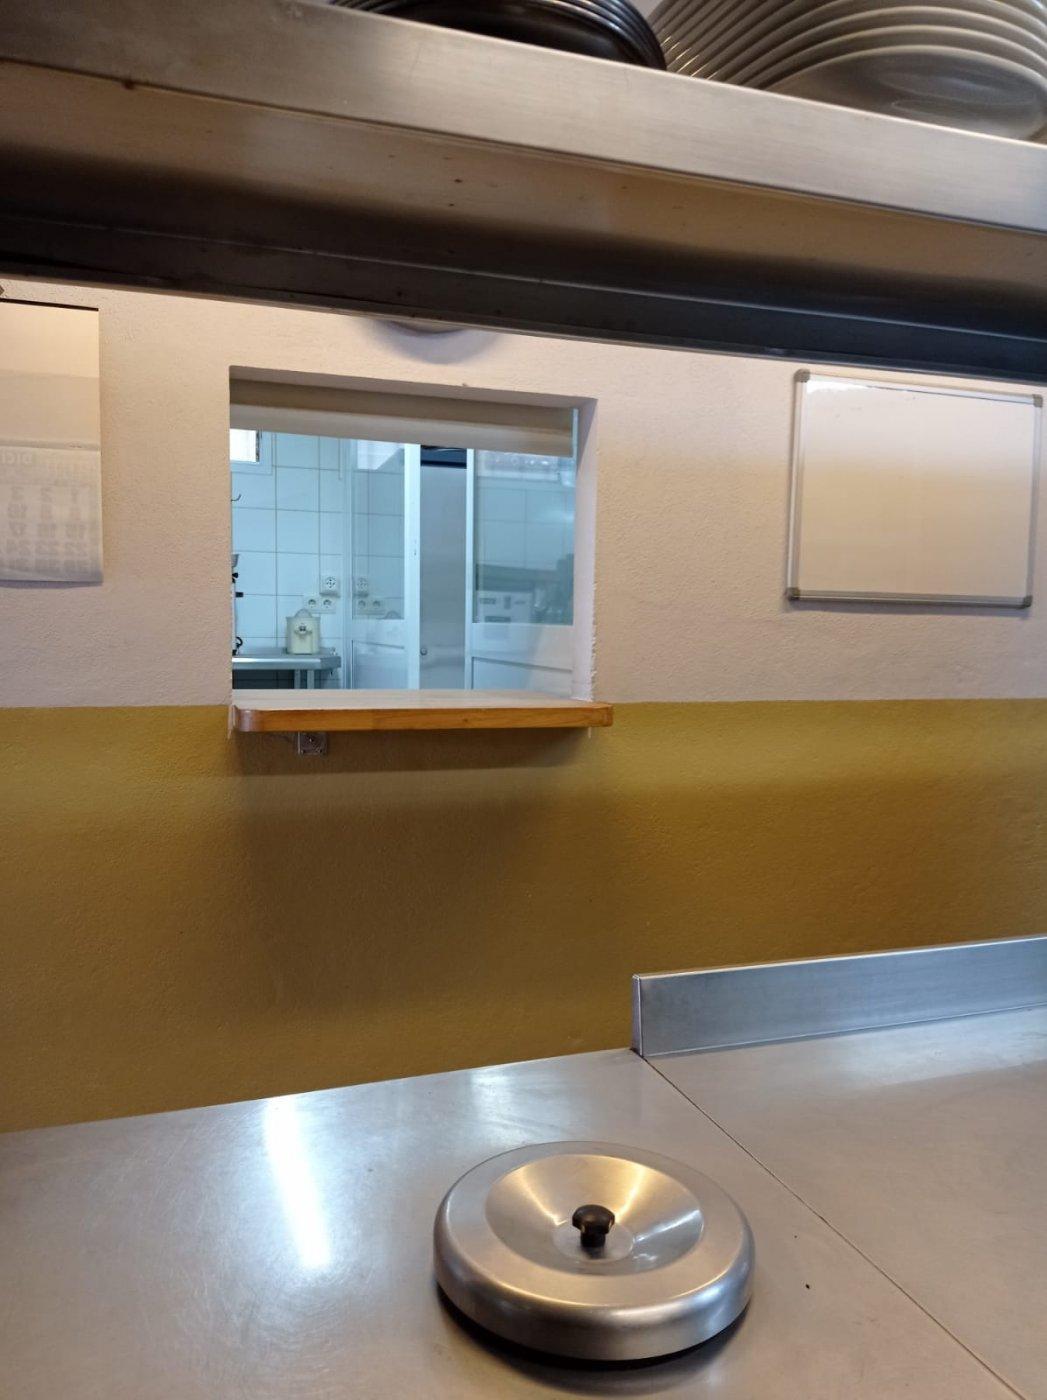 Venta o alquiler con opciÓn a compra de restaurante-bar en el centro de mahÓn totalmente e - imagenInmueble17